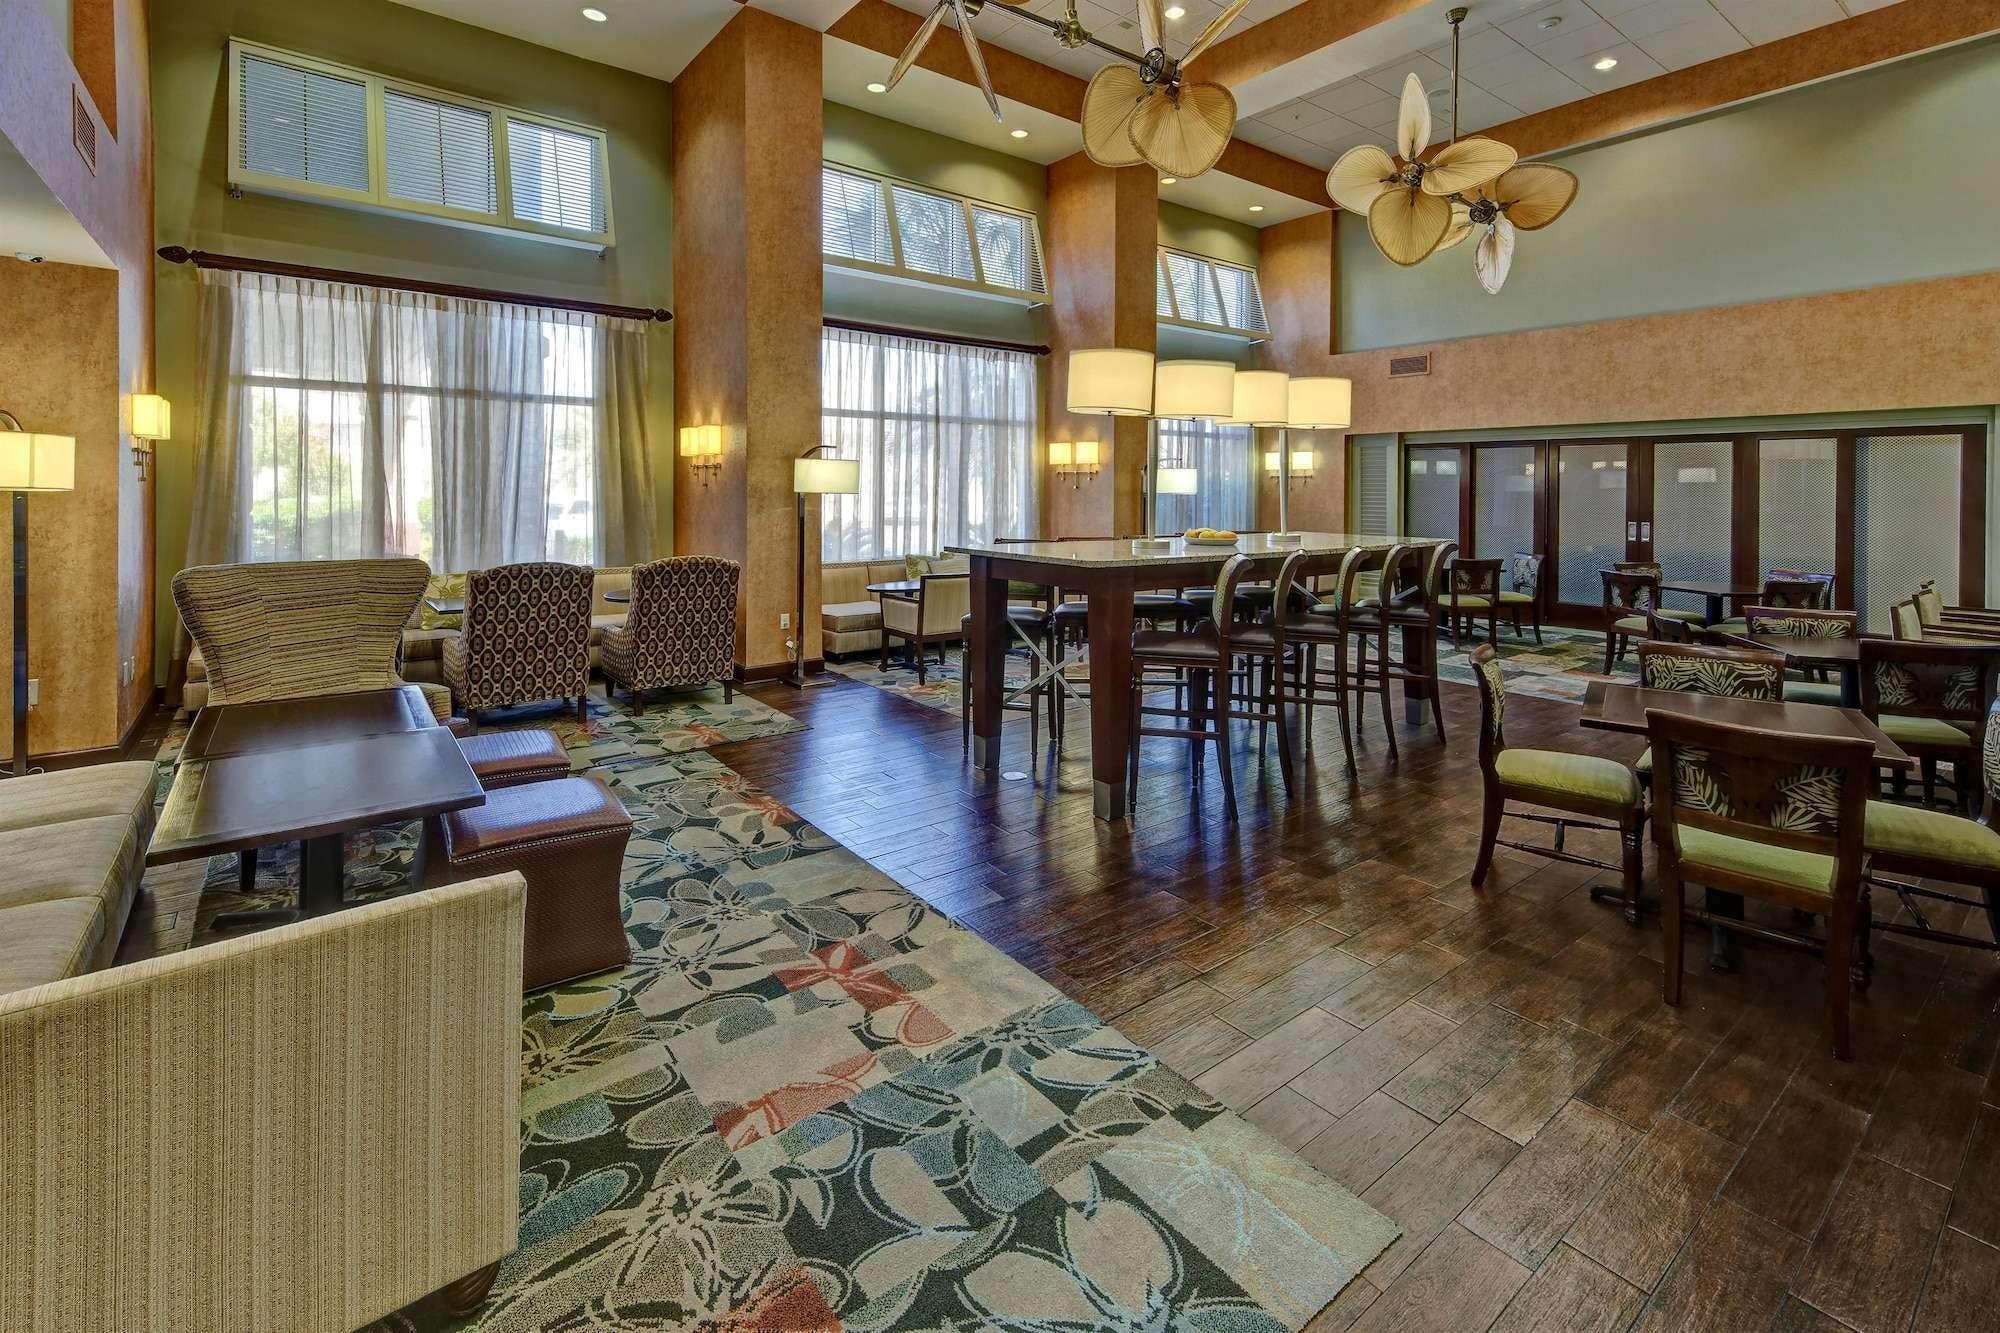 Hampton Inn & Suites Destin-Sandestin Area